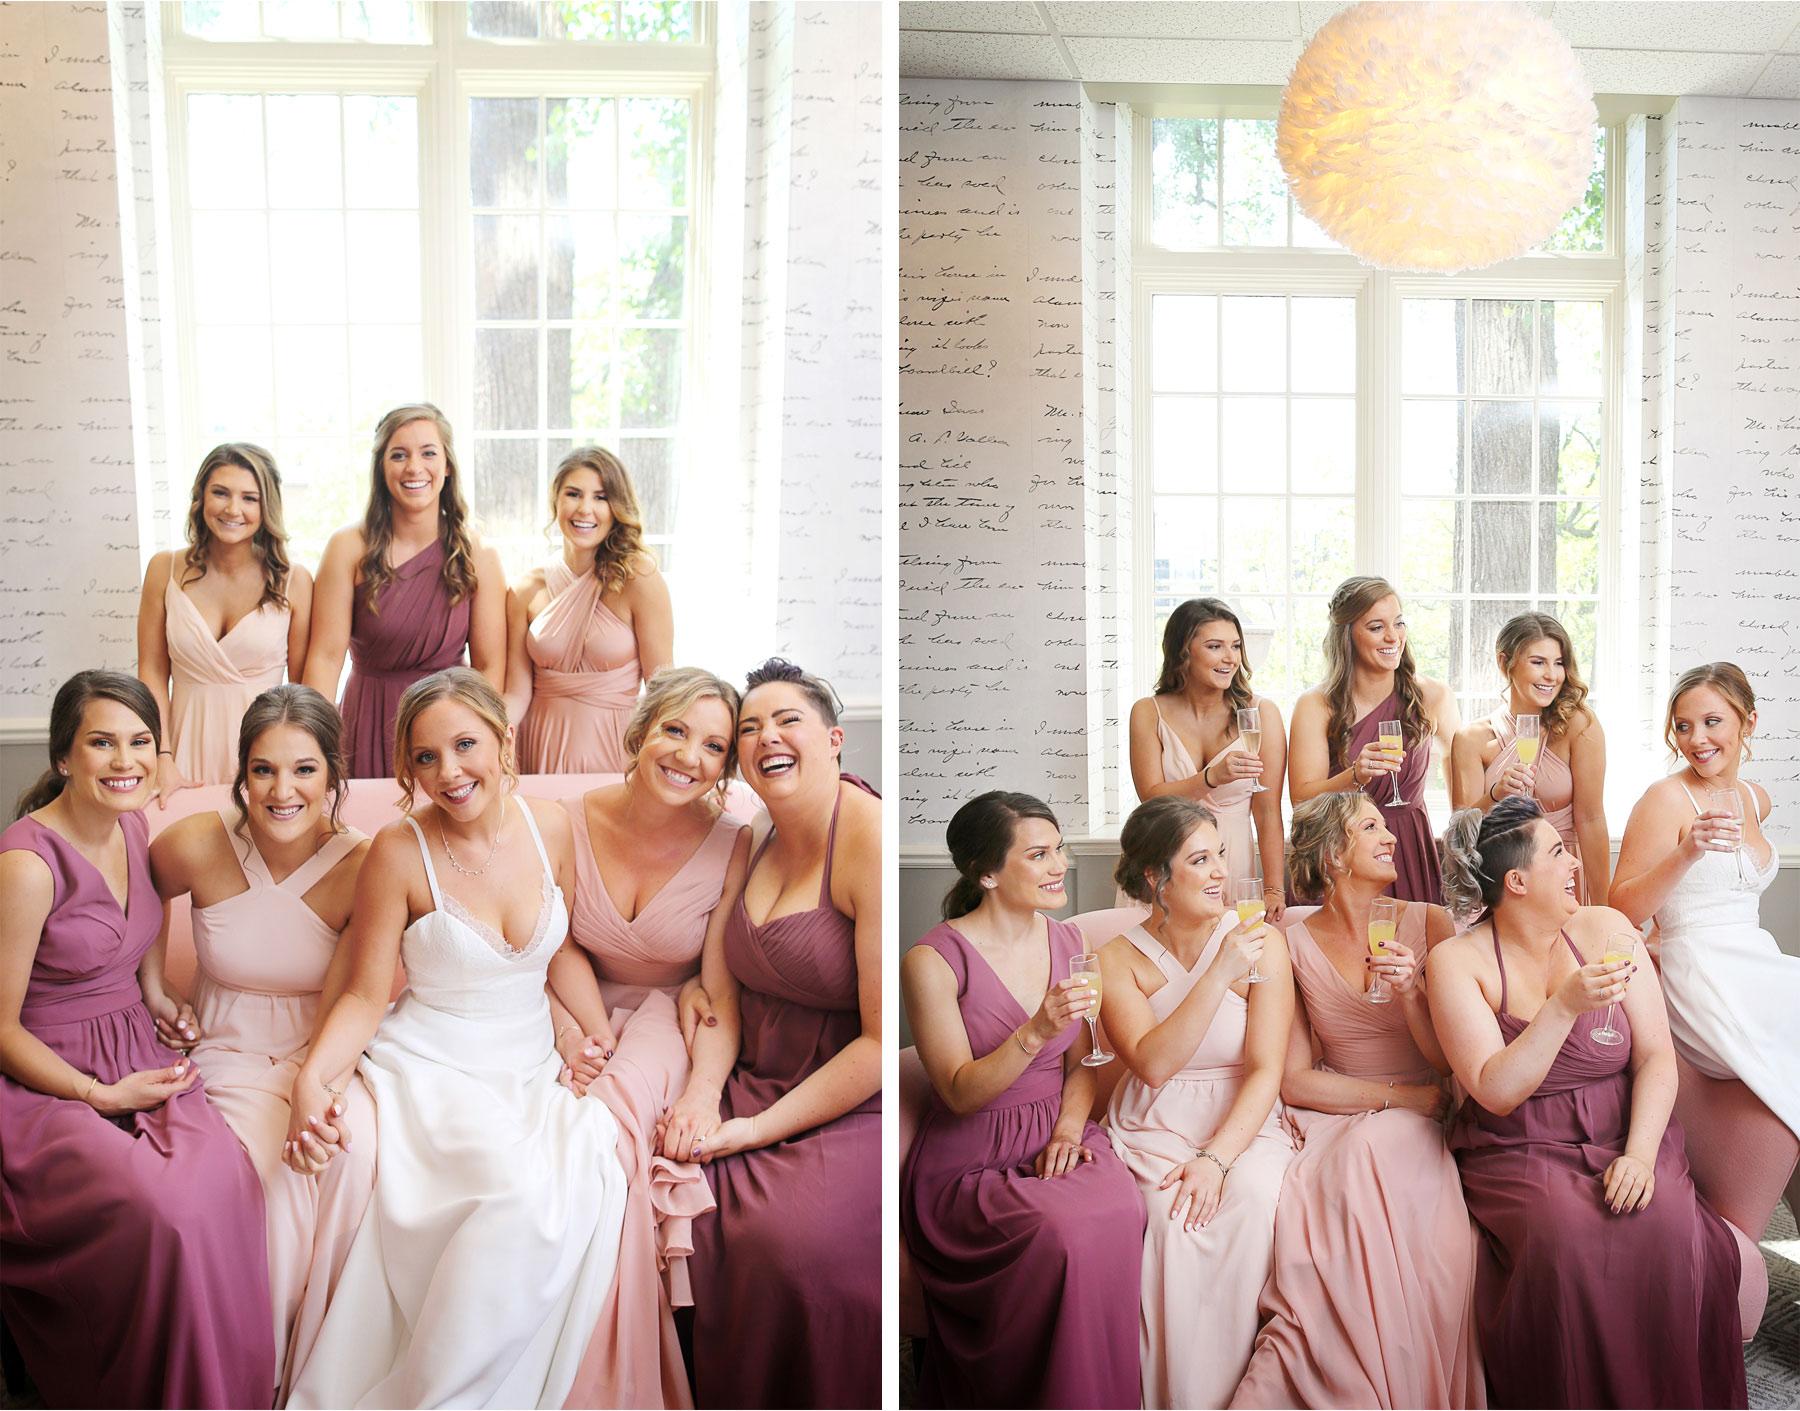 02-Minneapolis-Minnesota-Wedding-Andrew-Vick-Photography-Calhoun-Beach-Club-Bride-Bridesmaids-Champagne-Toast-Pink-Samantha-and-Ryan.jpg